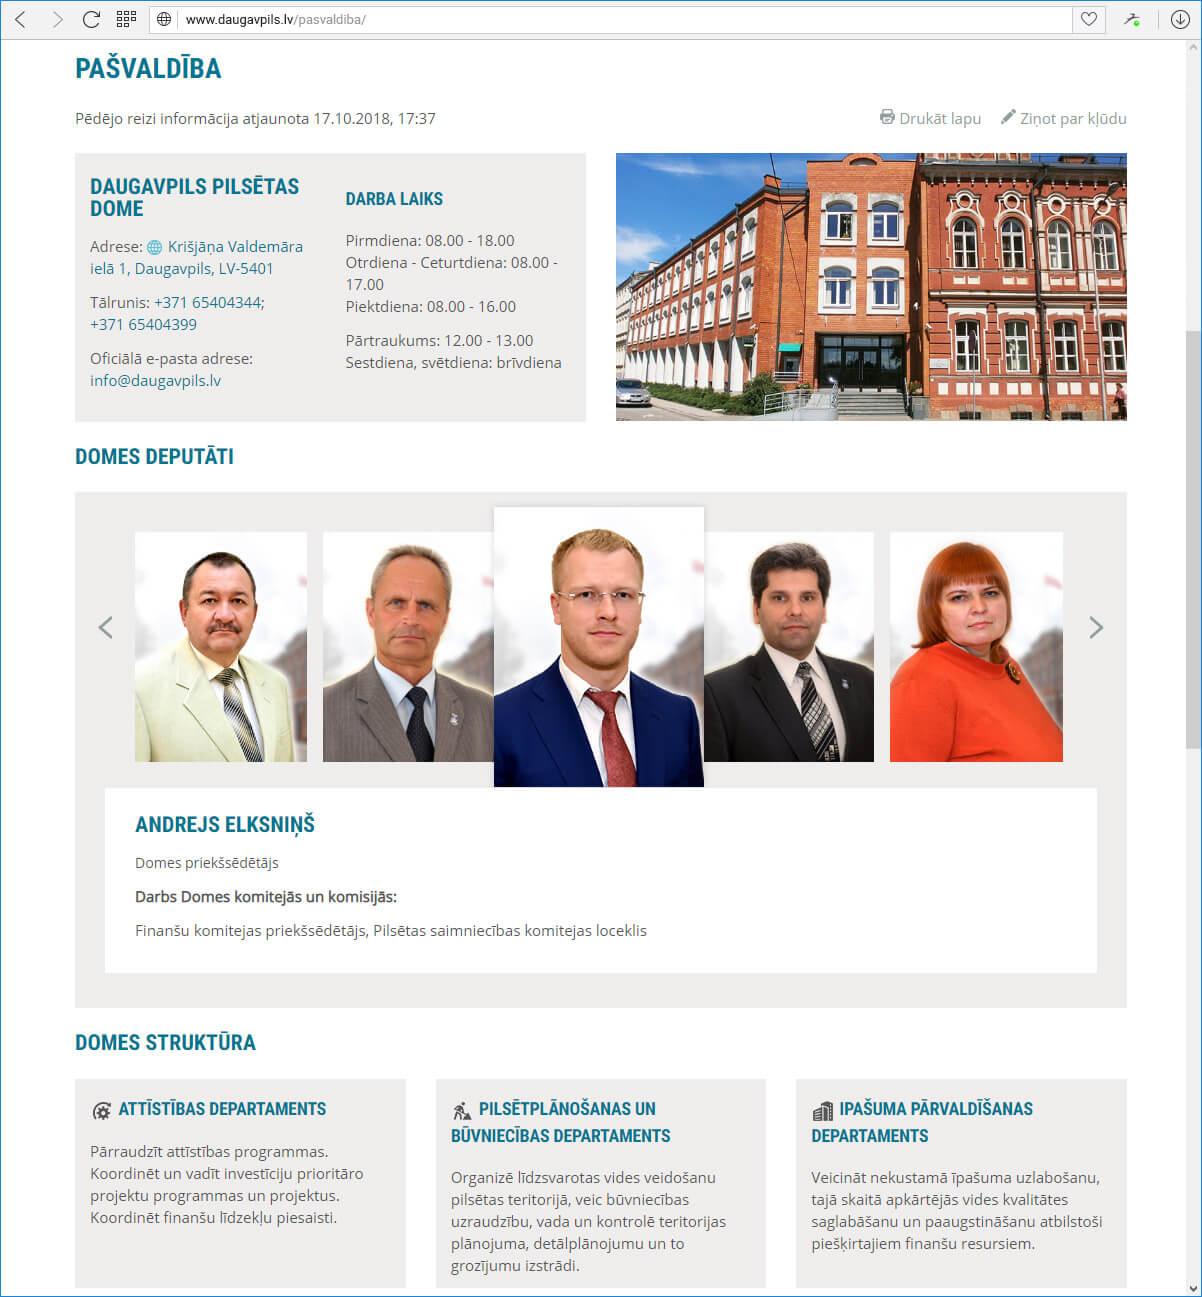 Daugavpils pilsētas domes mājas lapa Daugavpils.lv  - pašvaldība